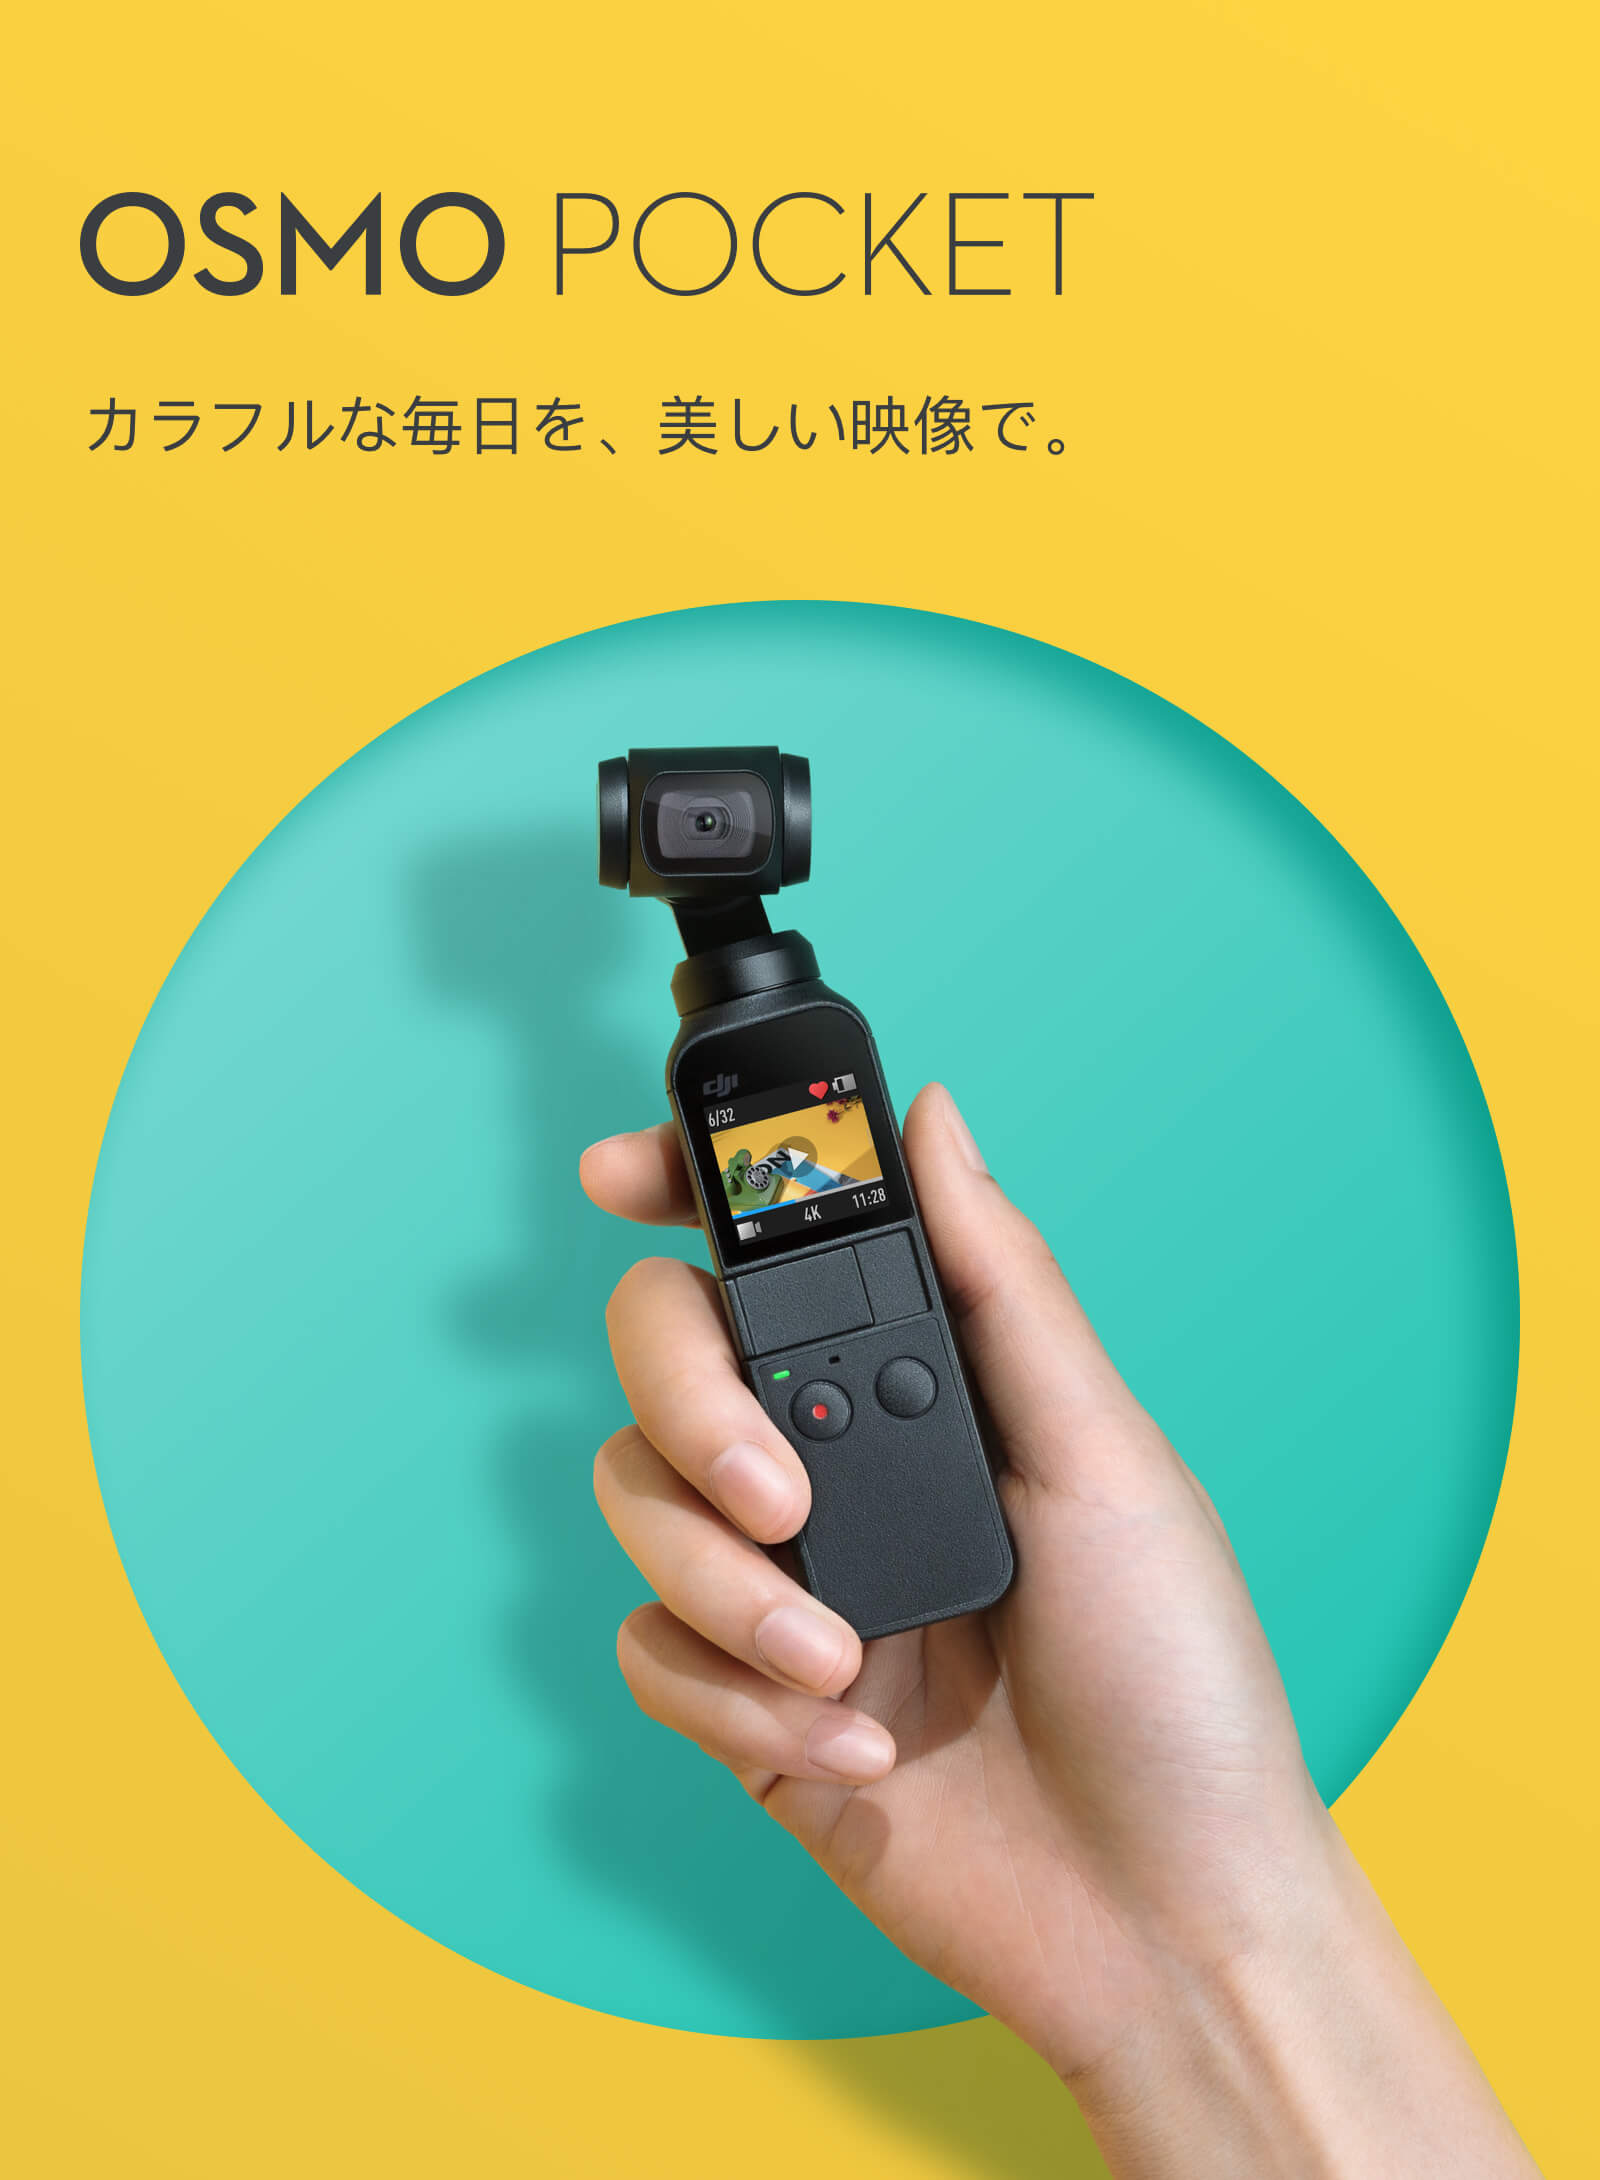 https://www.drone-station.net/images/DJI/pocket/pocket01.jpg